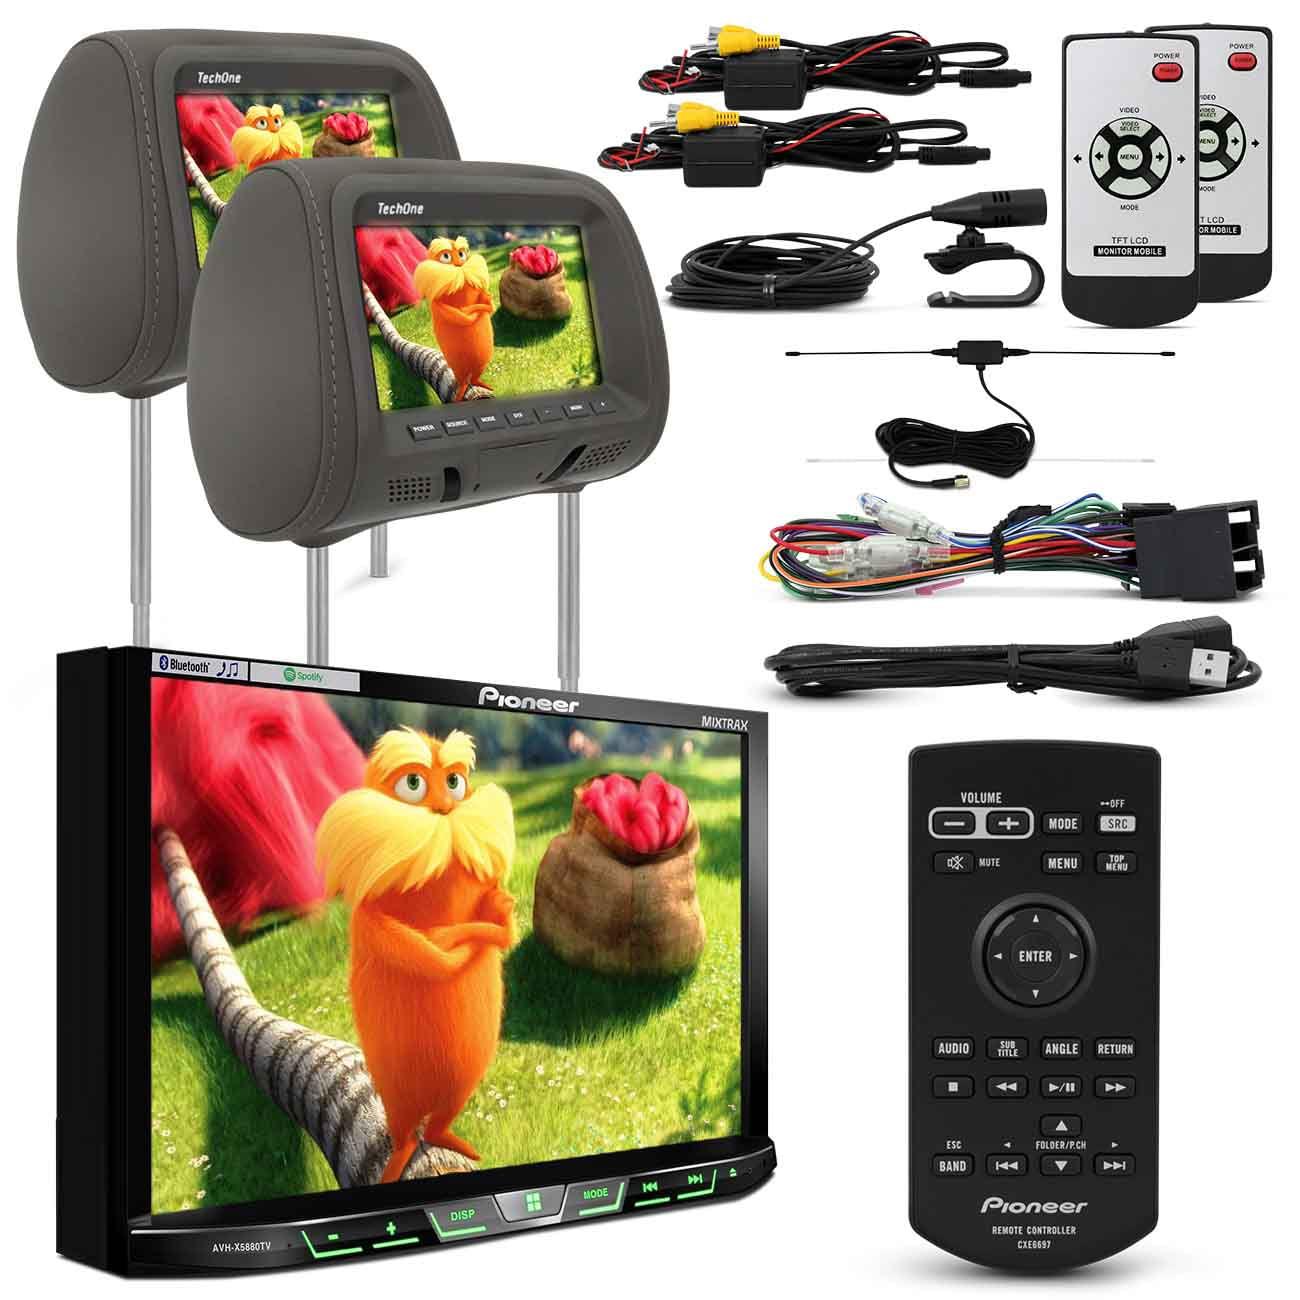 DVD Player Pioneer 2 Din Bluetooth + Par Telas Encosto LCD 7 Polegadas Grafite Escravo